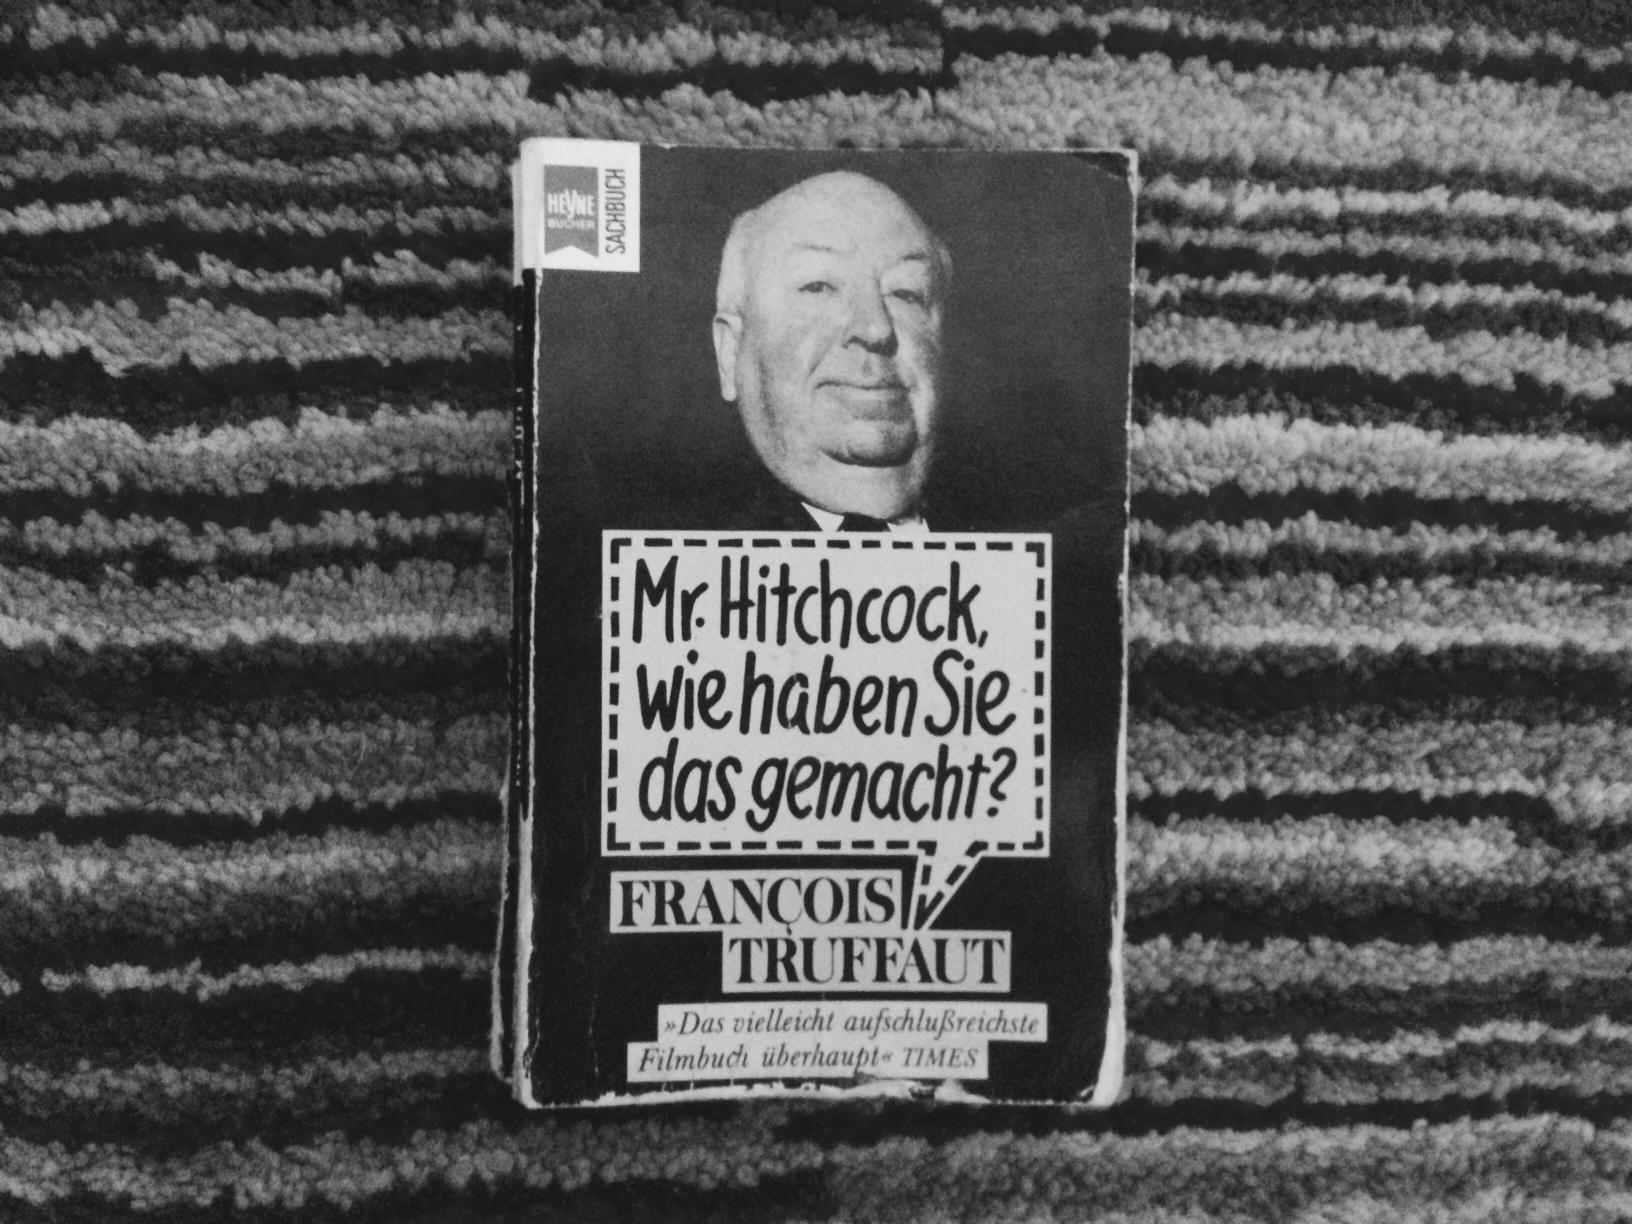 Hitchcock, seien besten Filme - kekinwien.at